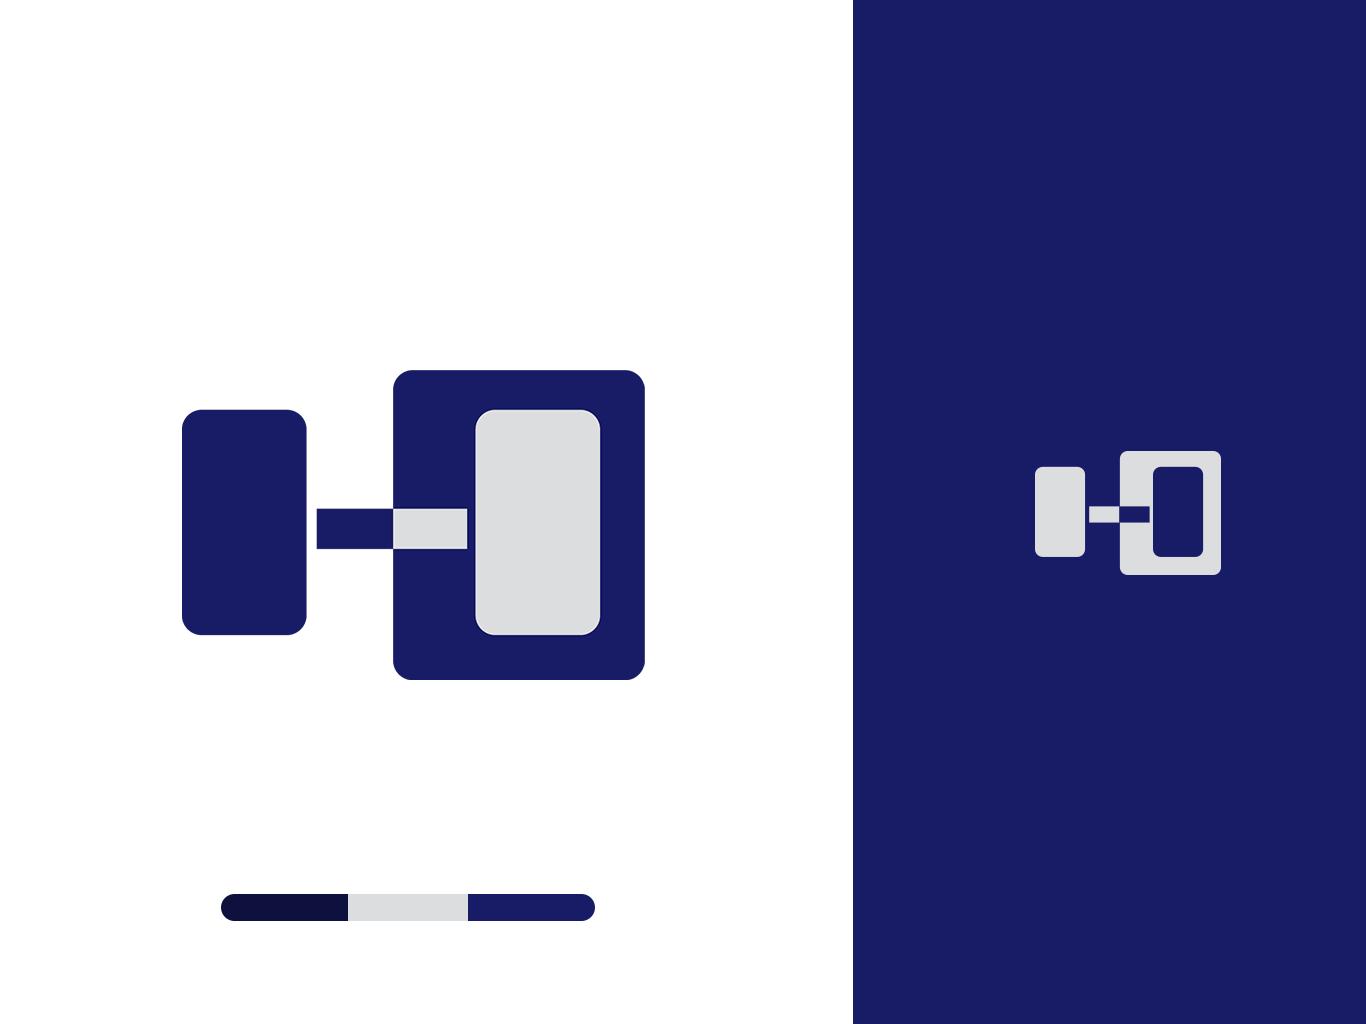 Hubb Fitness Branding ID illustration design logo branding and identity